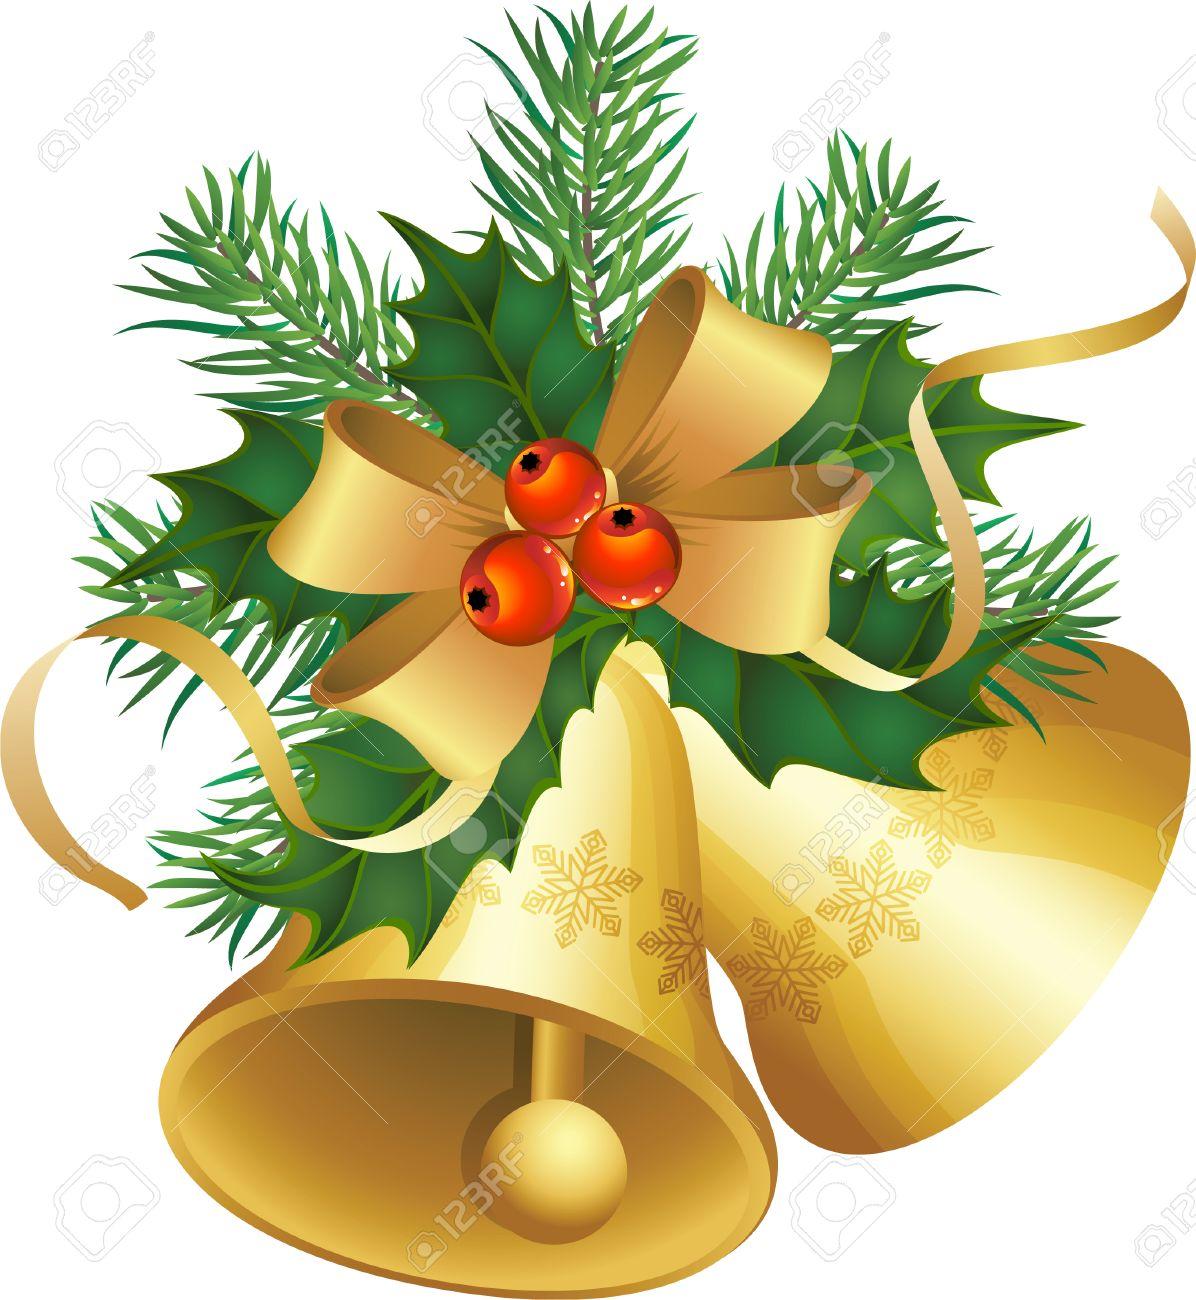 Vector Illustrations - Christmas Decor And Symbols Royalty Free ...